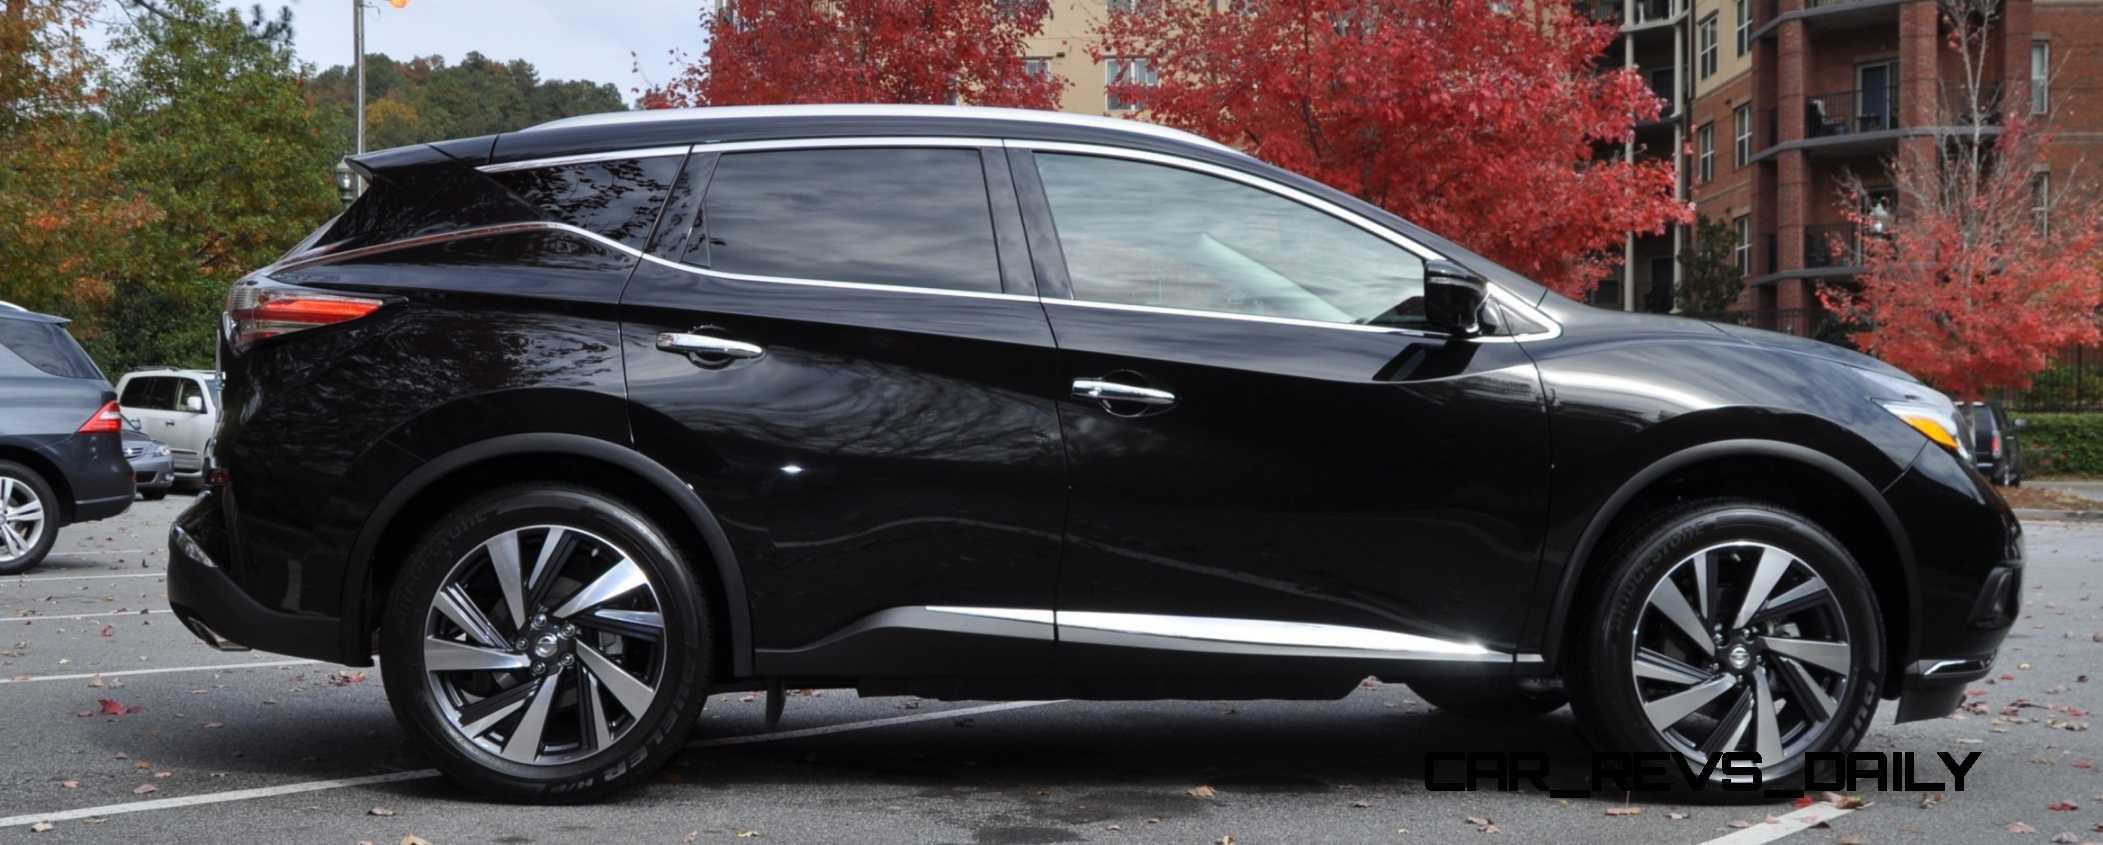 2015 Nissan Murano Platinum Awd In 150 Photo Debut